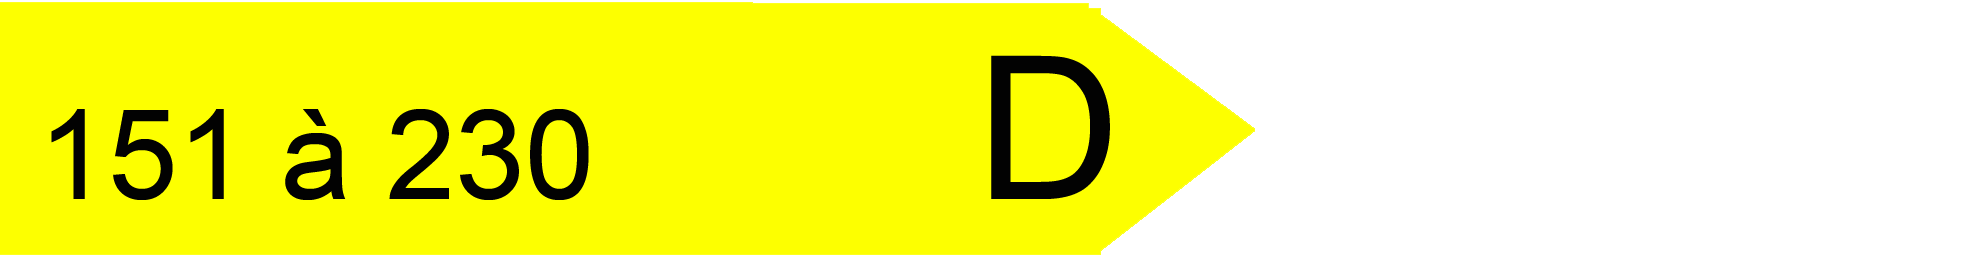 Indice DPE D